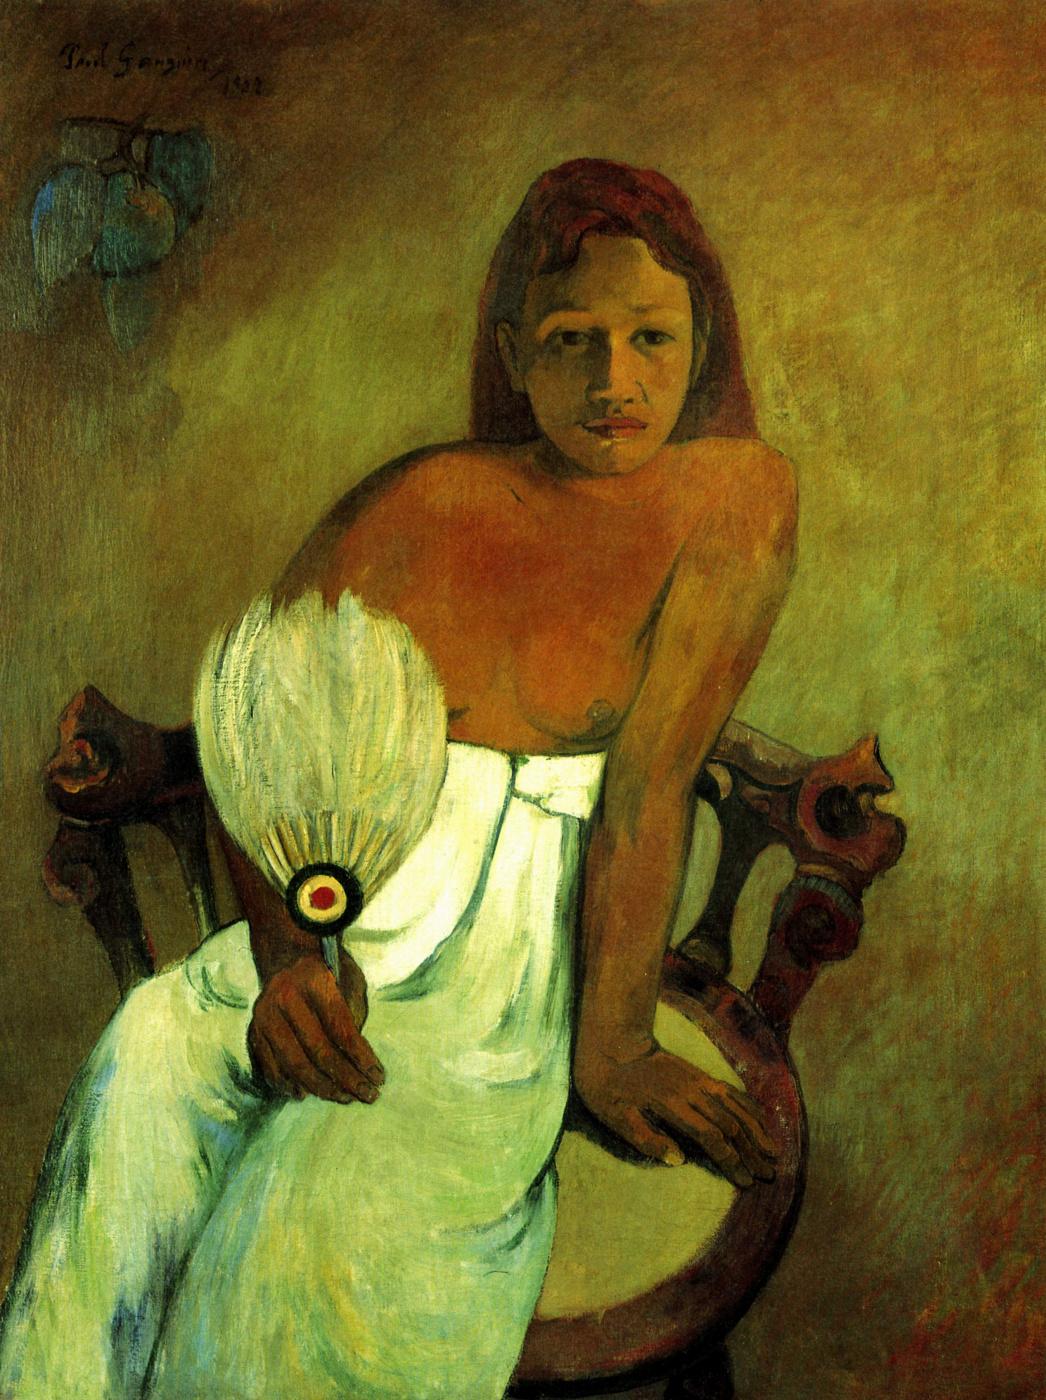 Paul Gauguin. Young girl with a fan